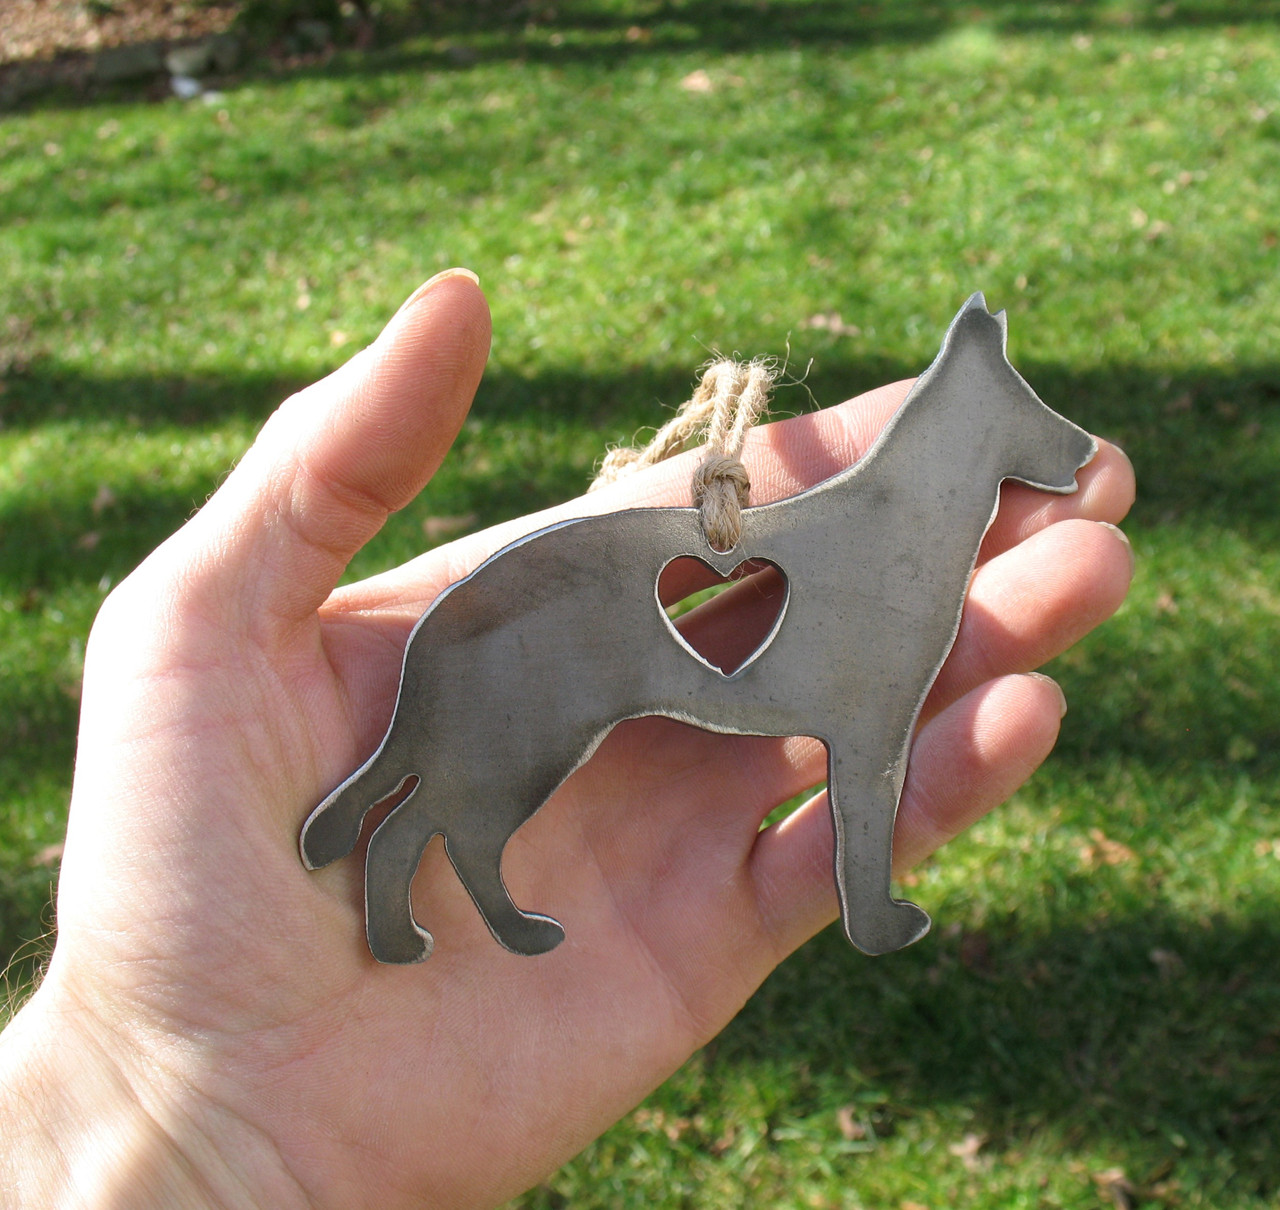 German Shepherd Dog Ornament 1 - Metal Dog Easter Basket Gift for Her Him- Pet Lover Memorial Ornament Pet Loss Dog Remembrance Gift